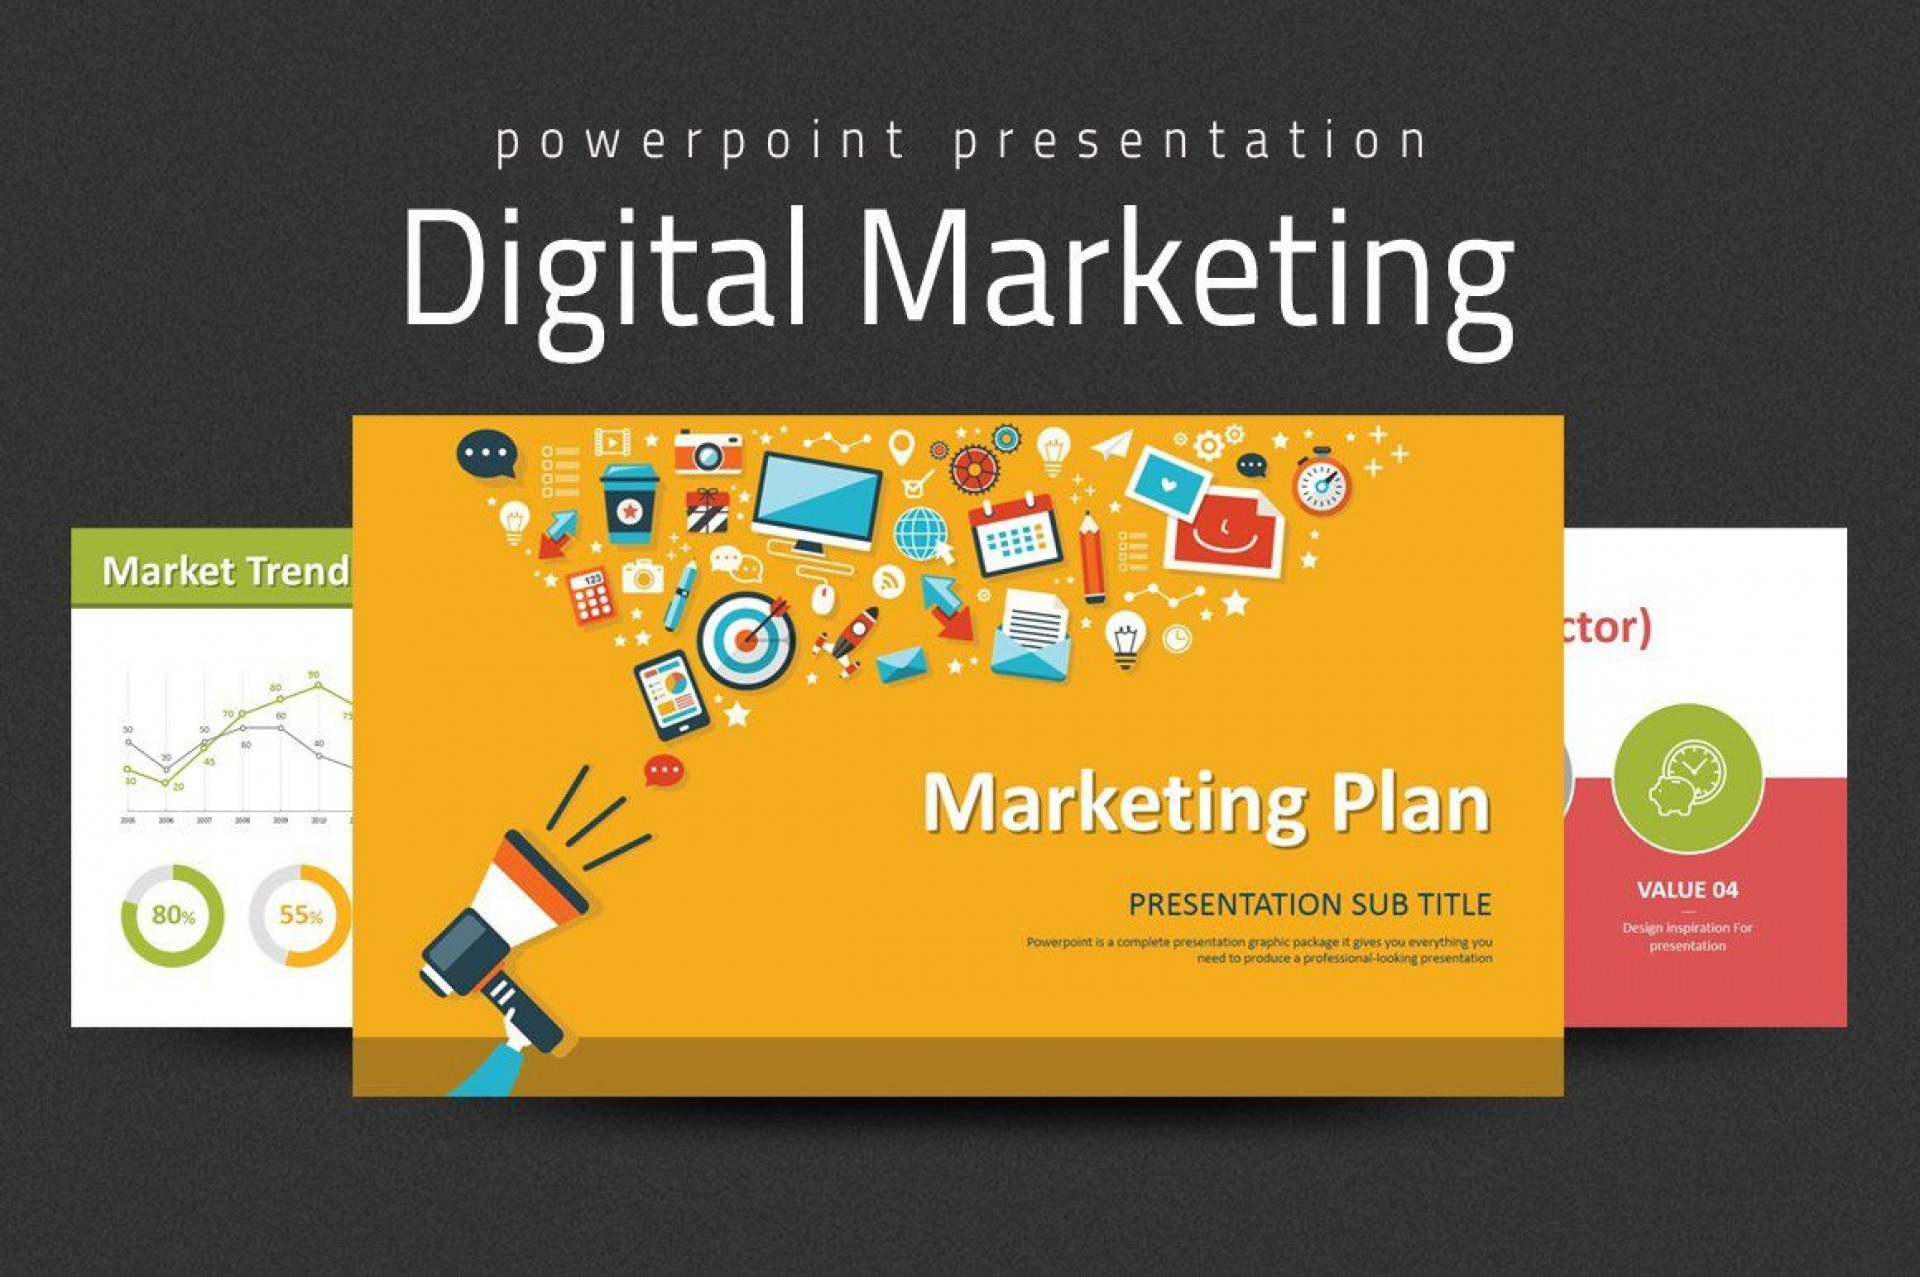 000 Simple Digital Marketing Plan Ppt Presentation Highest Quality 1920